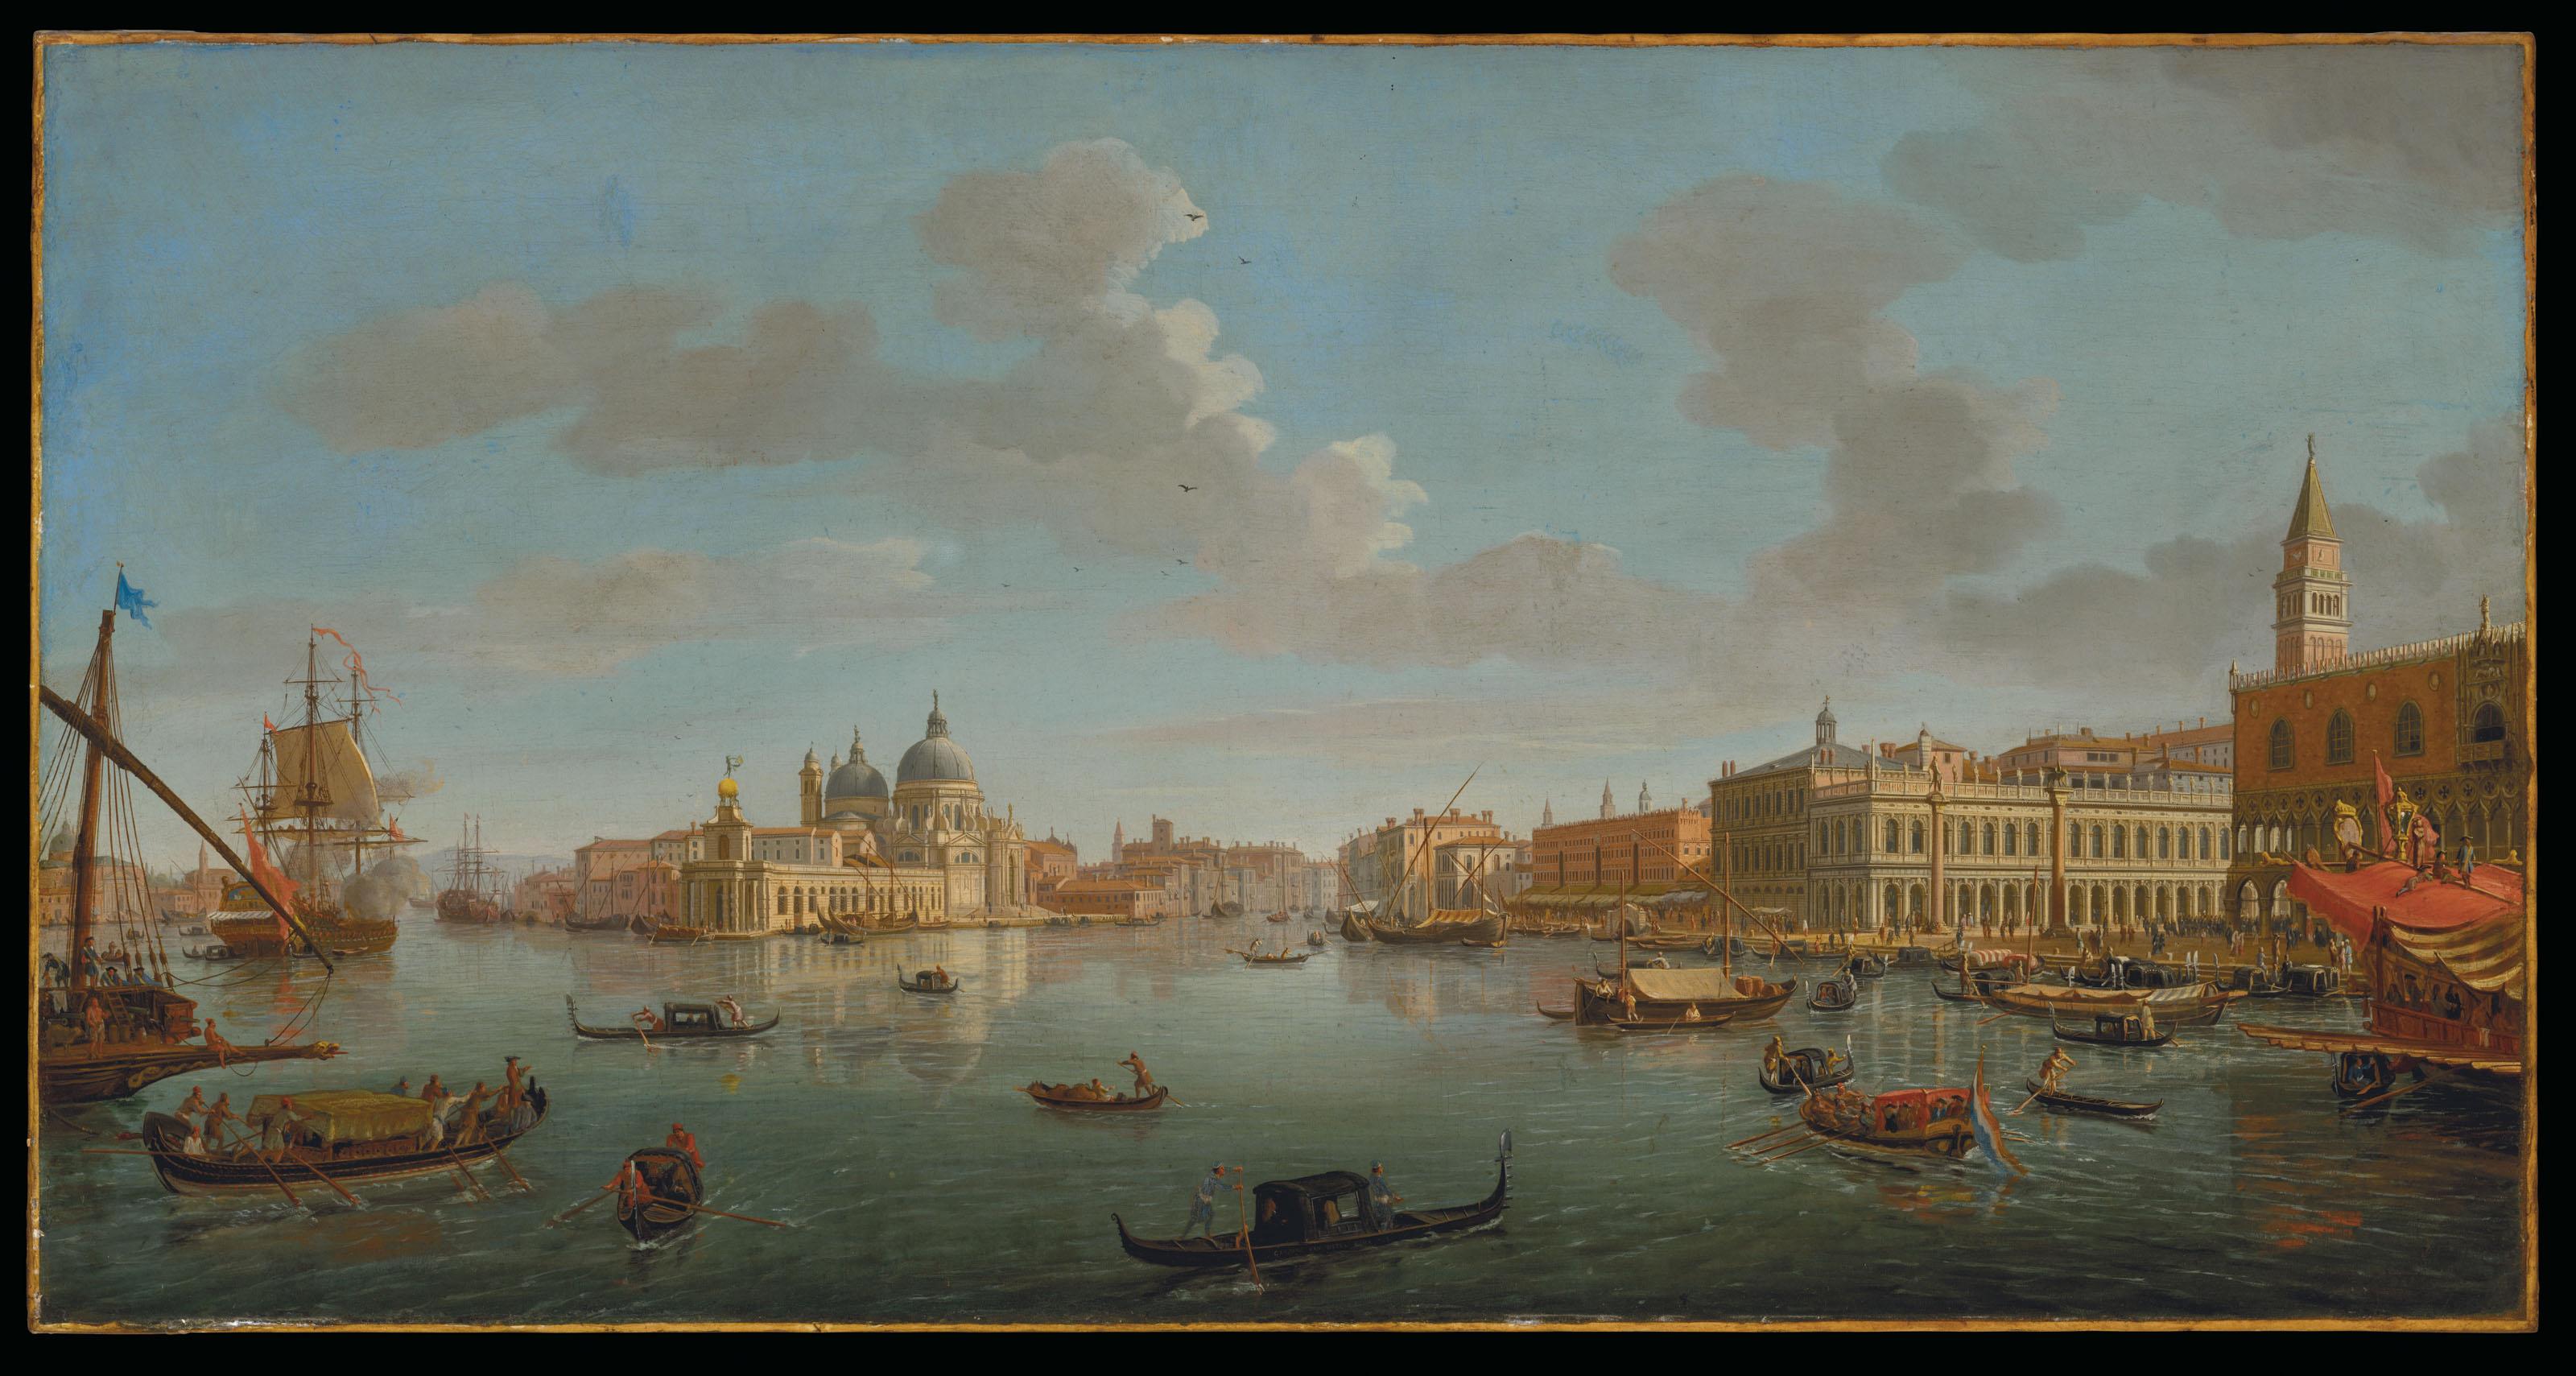 GASPAR VAN WITTEL, CALLED VANVITELLI (AMERSFOORT 1652/53-1736 ROME)